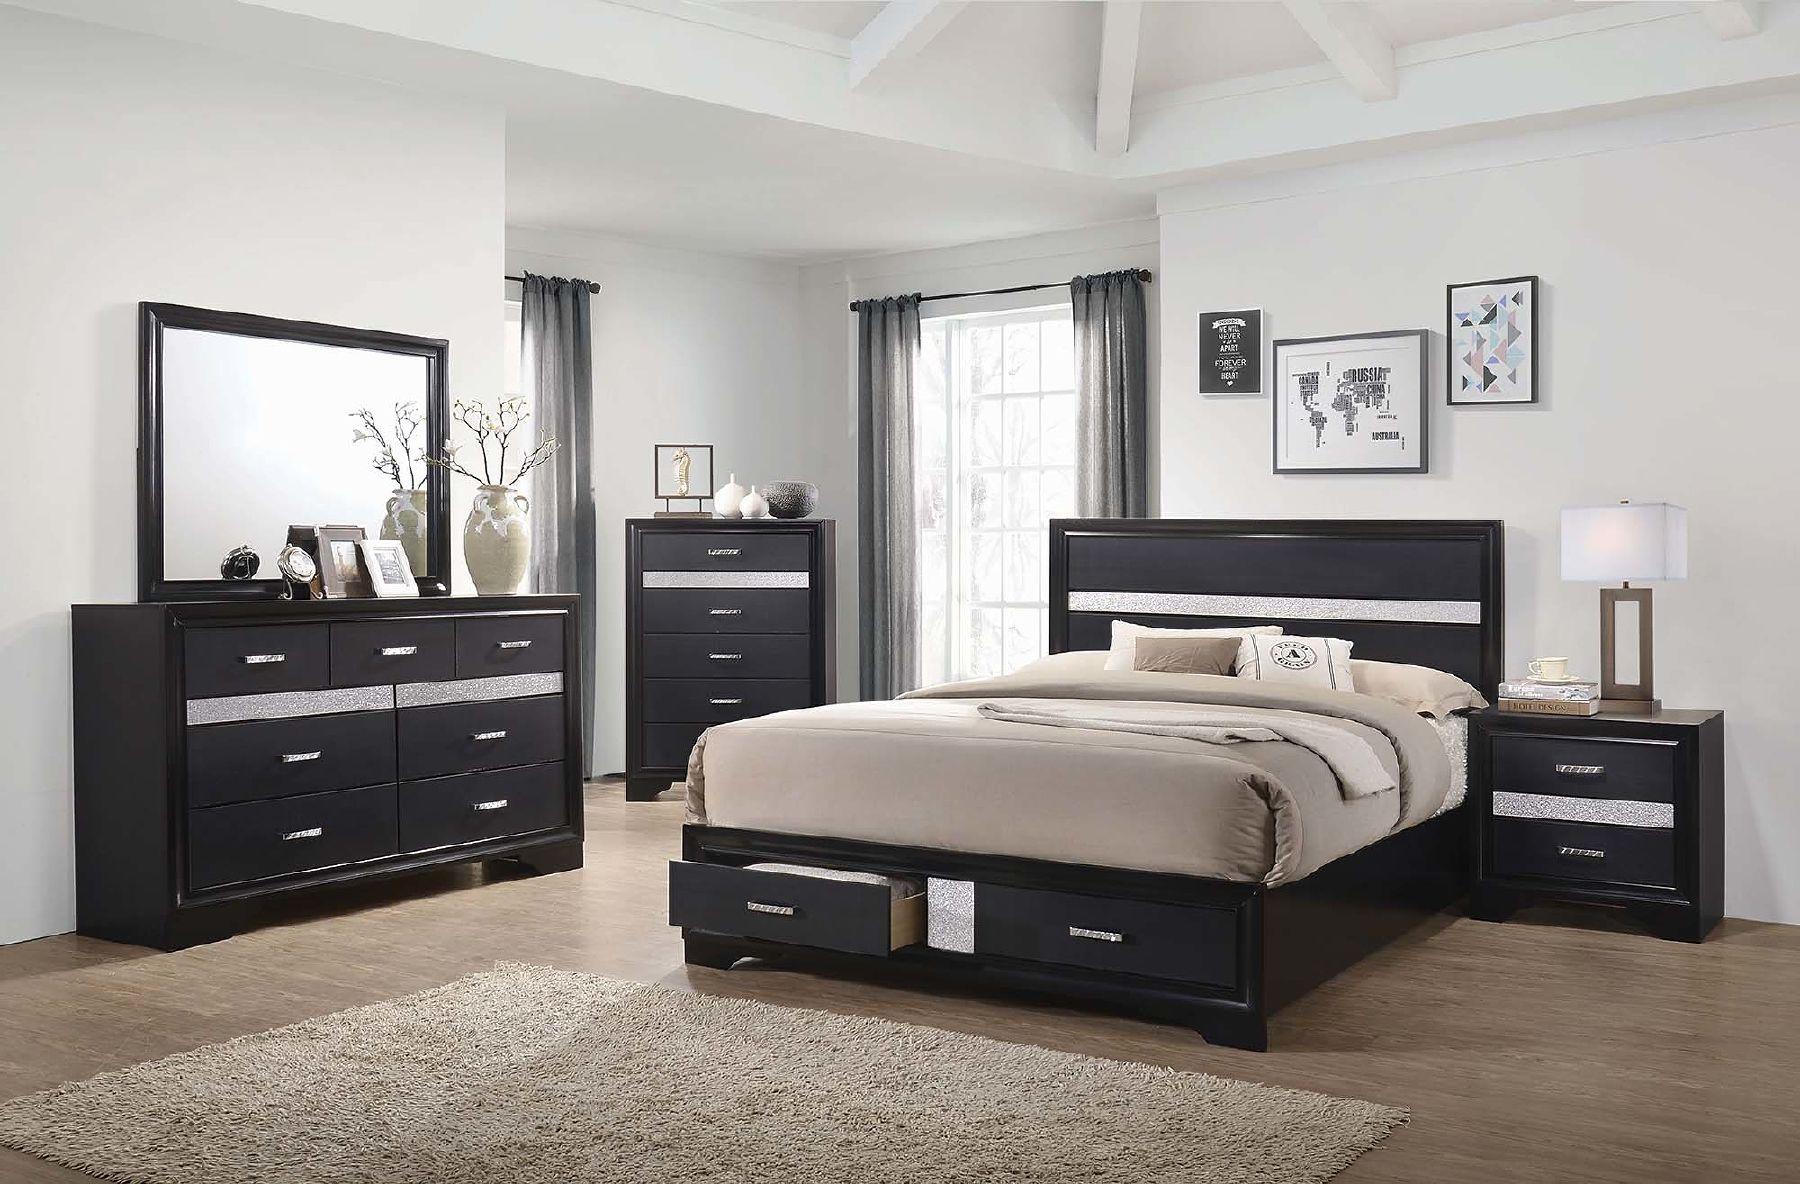 Miranda Black King Size Bed 206361ke Coaster Furniture King Size Beds In 2021 Bedroom Sets Queen Bedroom Furniture Sets Master Bedroom Furniture